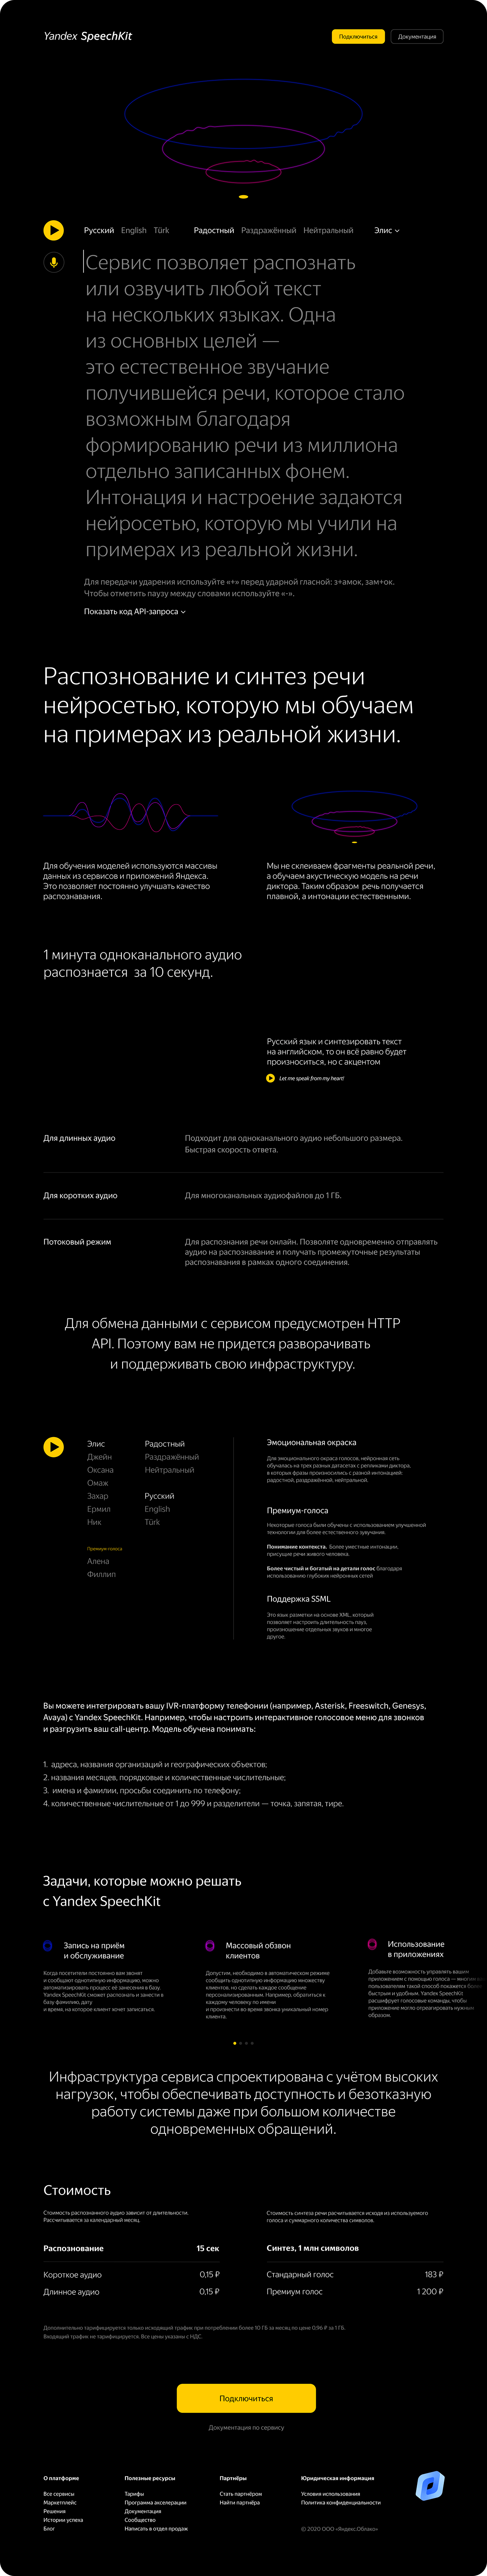 landing page speechkit UI yandex Form rhythm composition Web Interface Webdesign